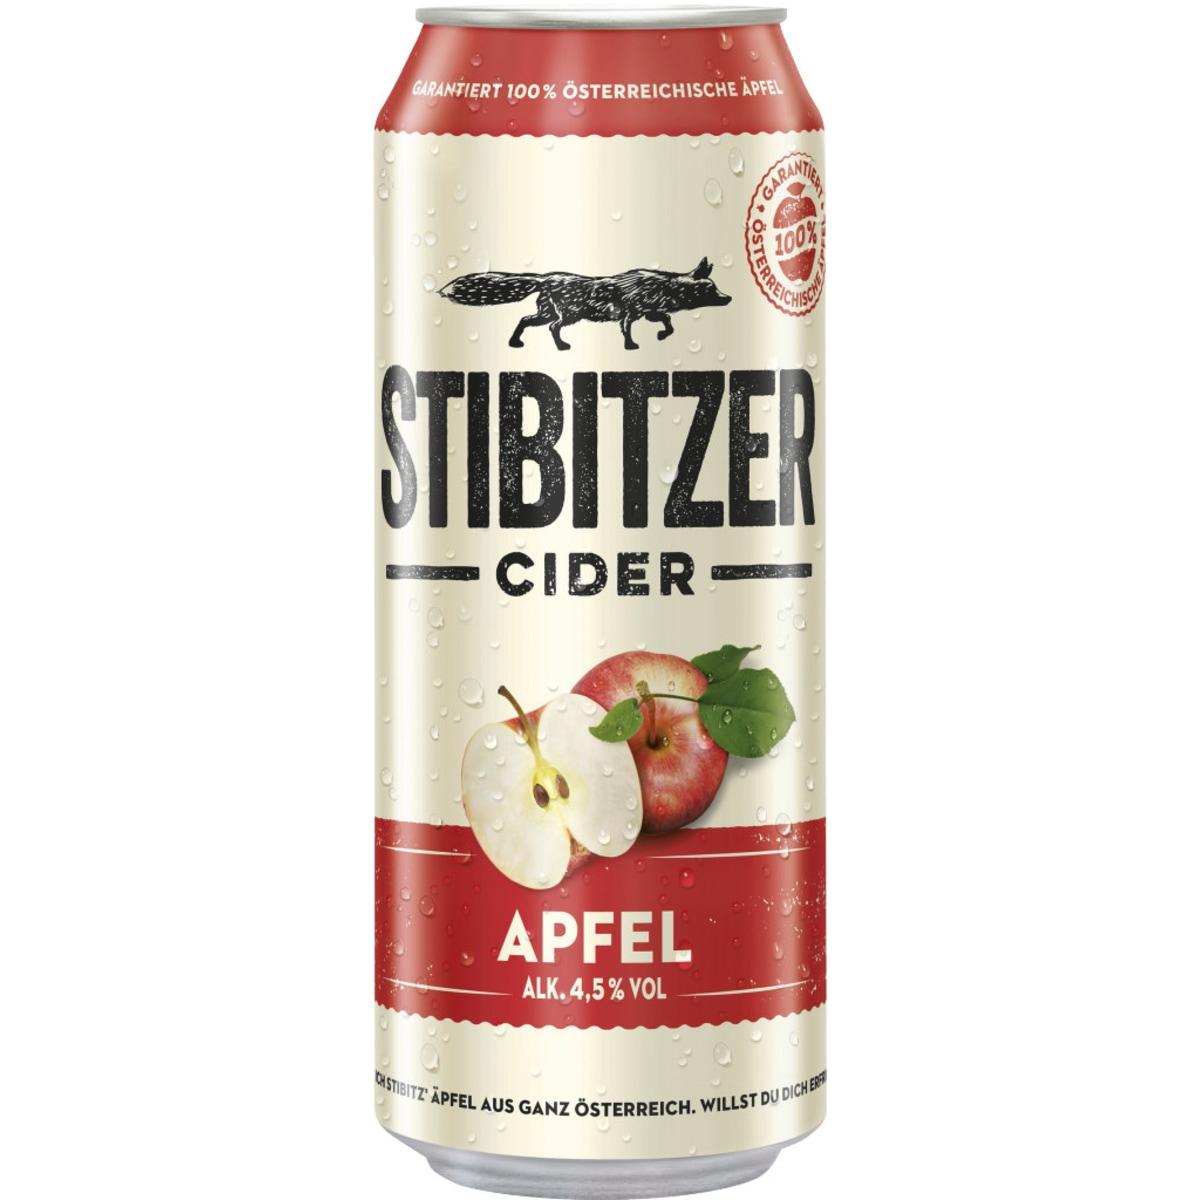 Stibitzer Apfel Cider 0,5l Dose